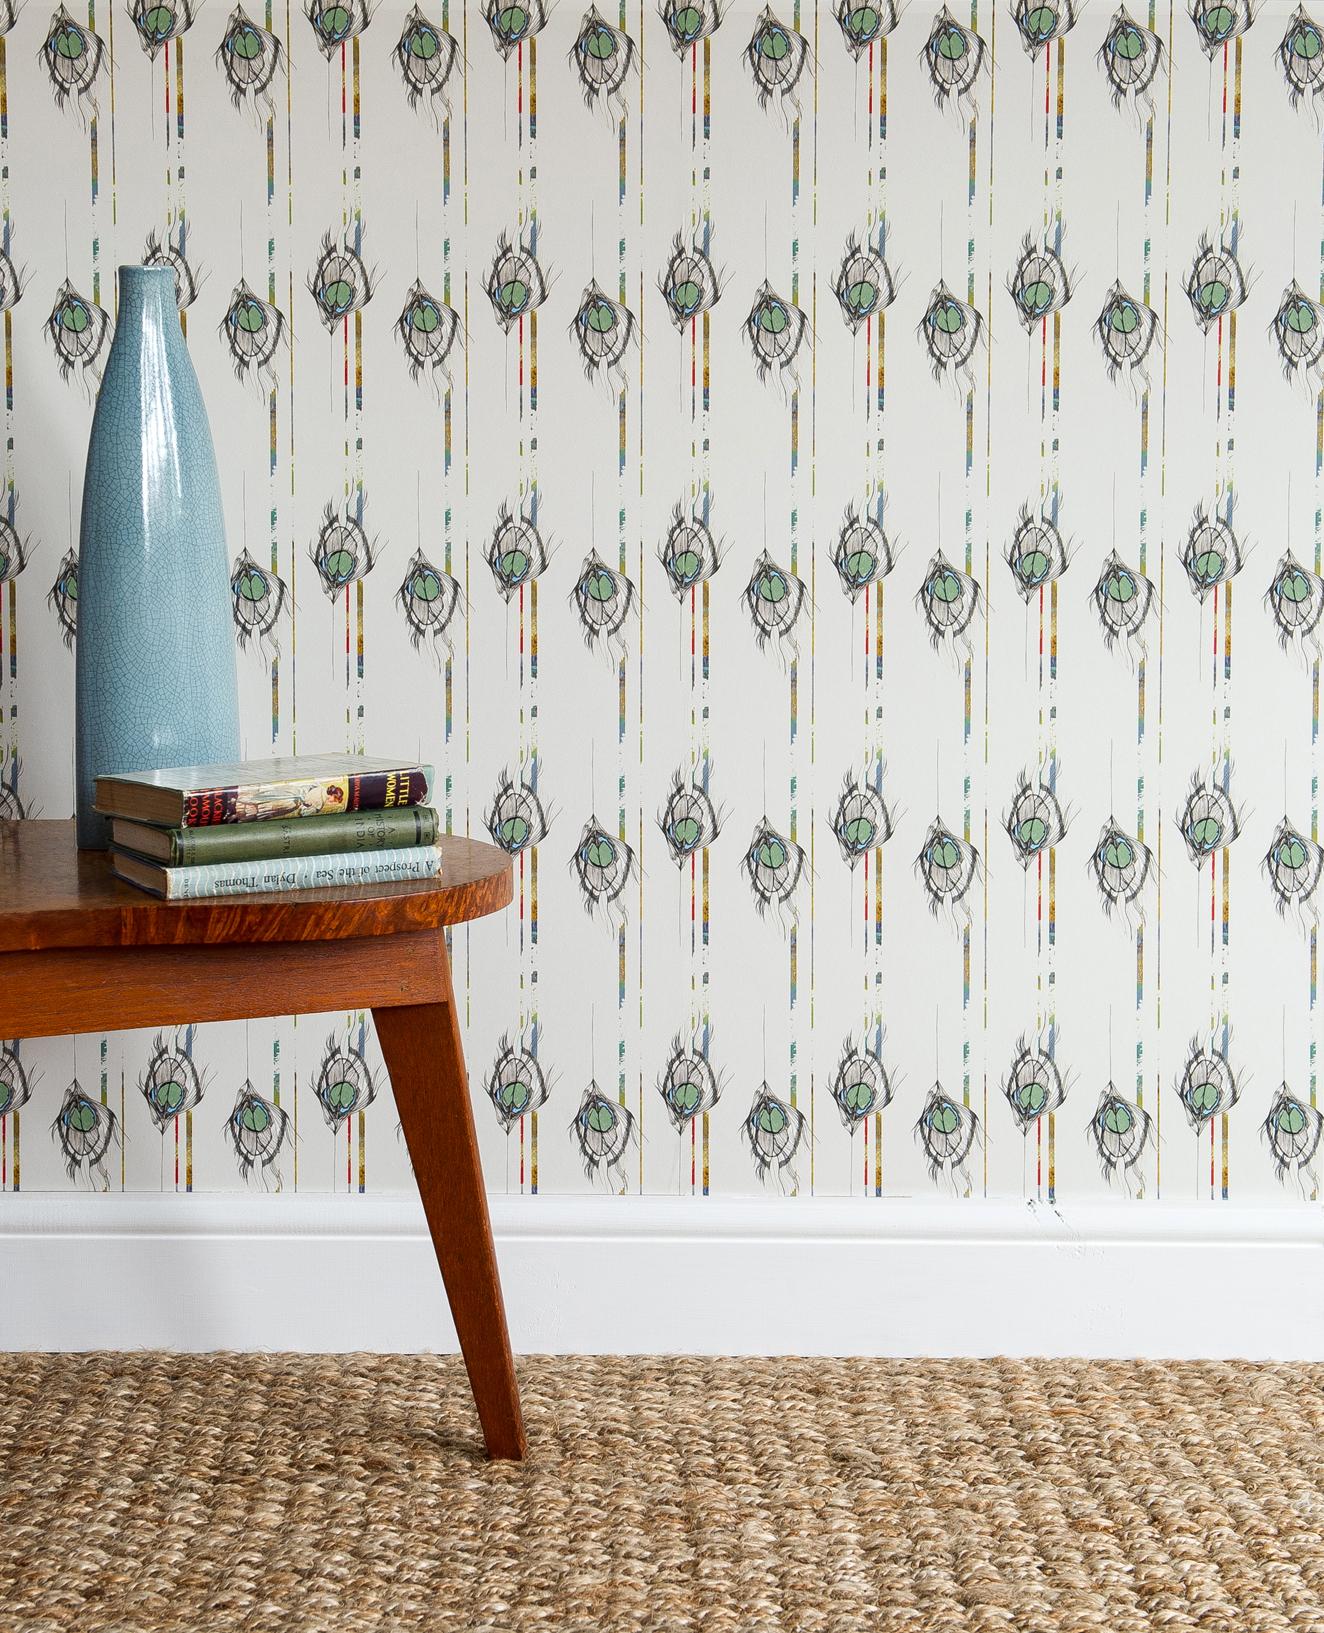 Undulating Feather luxury wallpaper